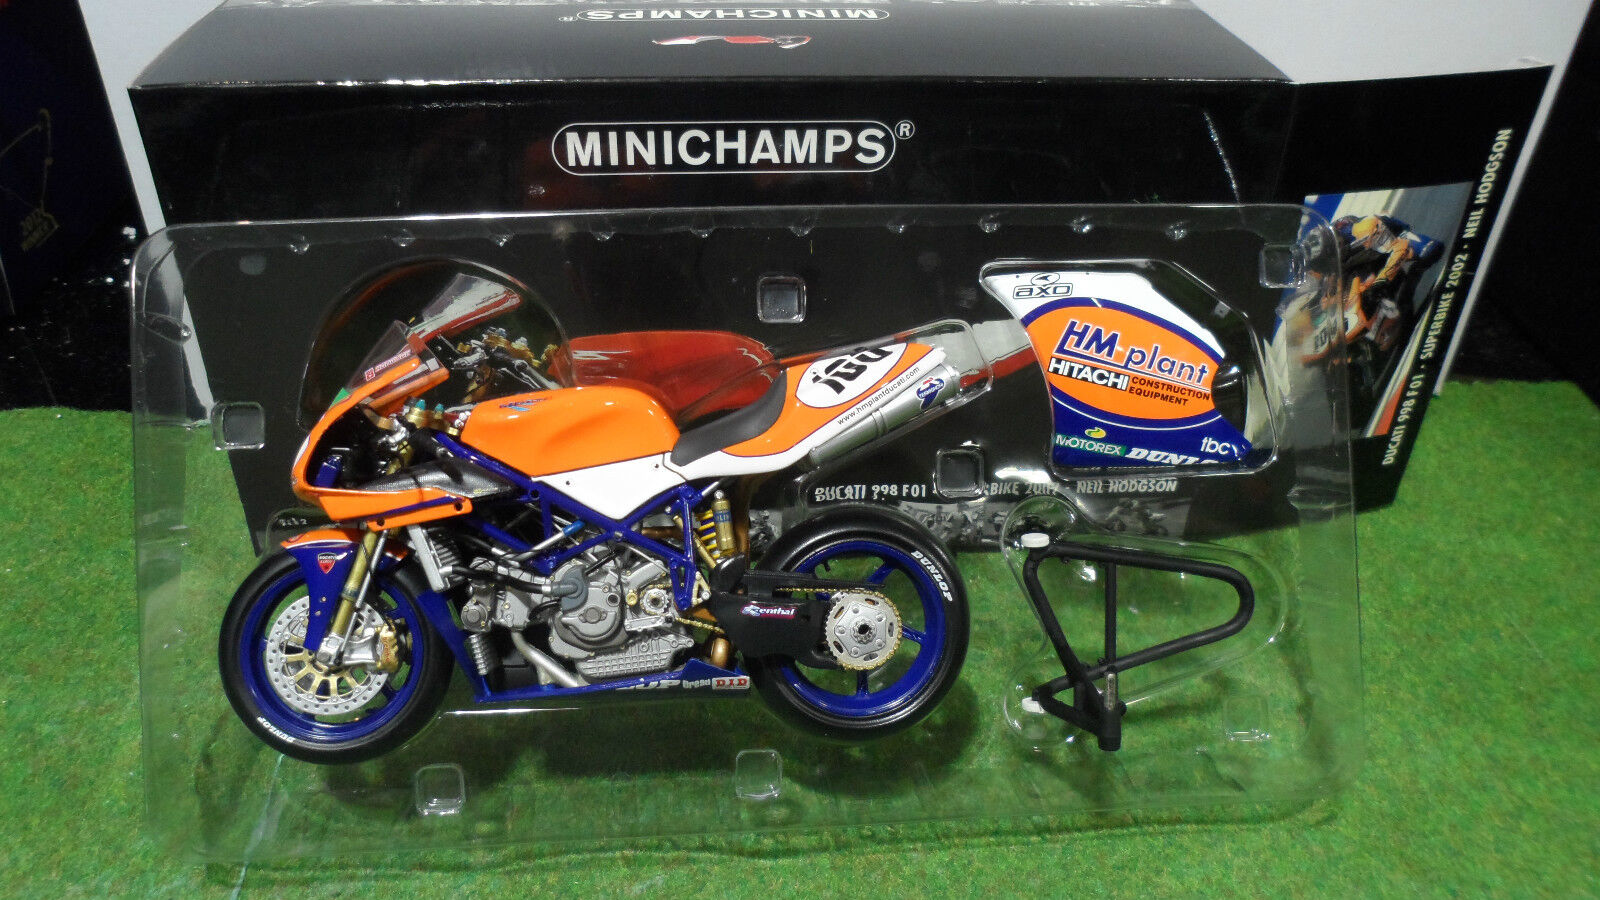 MOTO DUCATI 998 F01  WSB 2002 SUPERBIKE 1 12 Minichamps 122021200 miniature coll.  branché